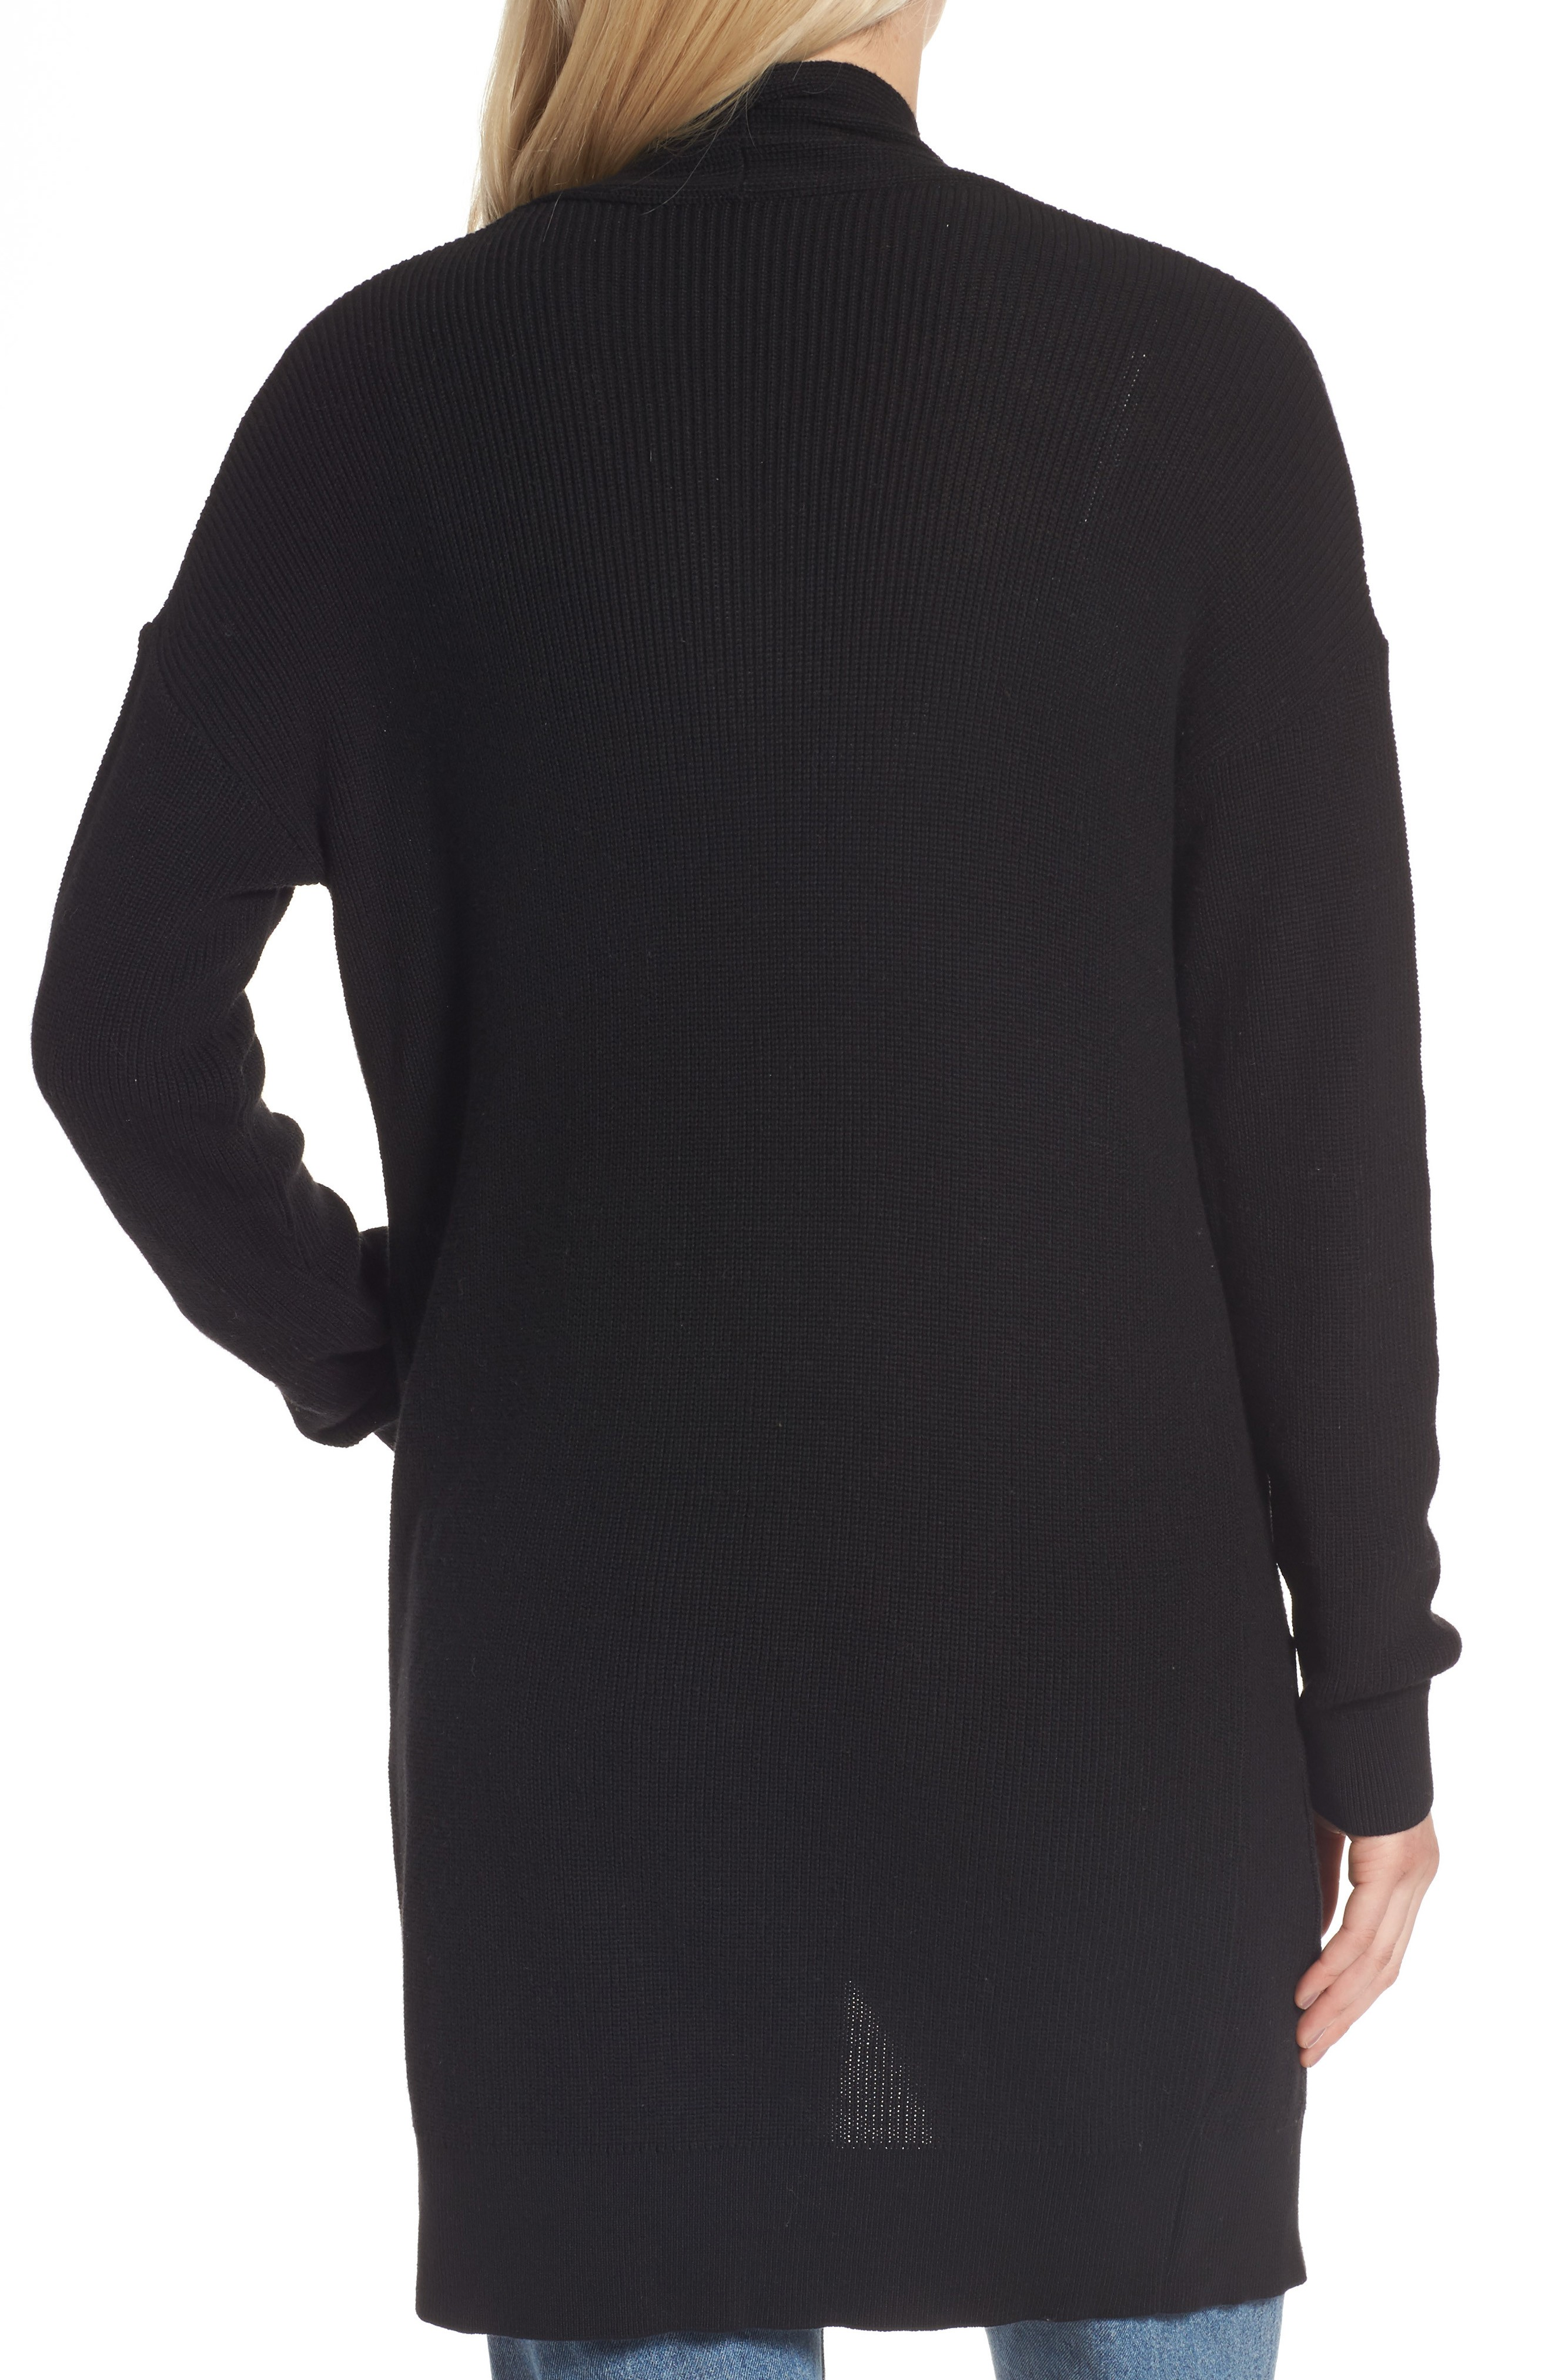 black Cardigan womenu0027s cardigan sweaters: long, cropped u0026 more   nordstrom UWWMZHA